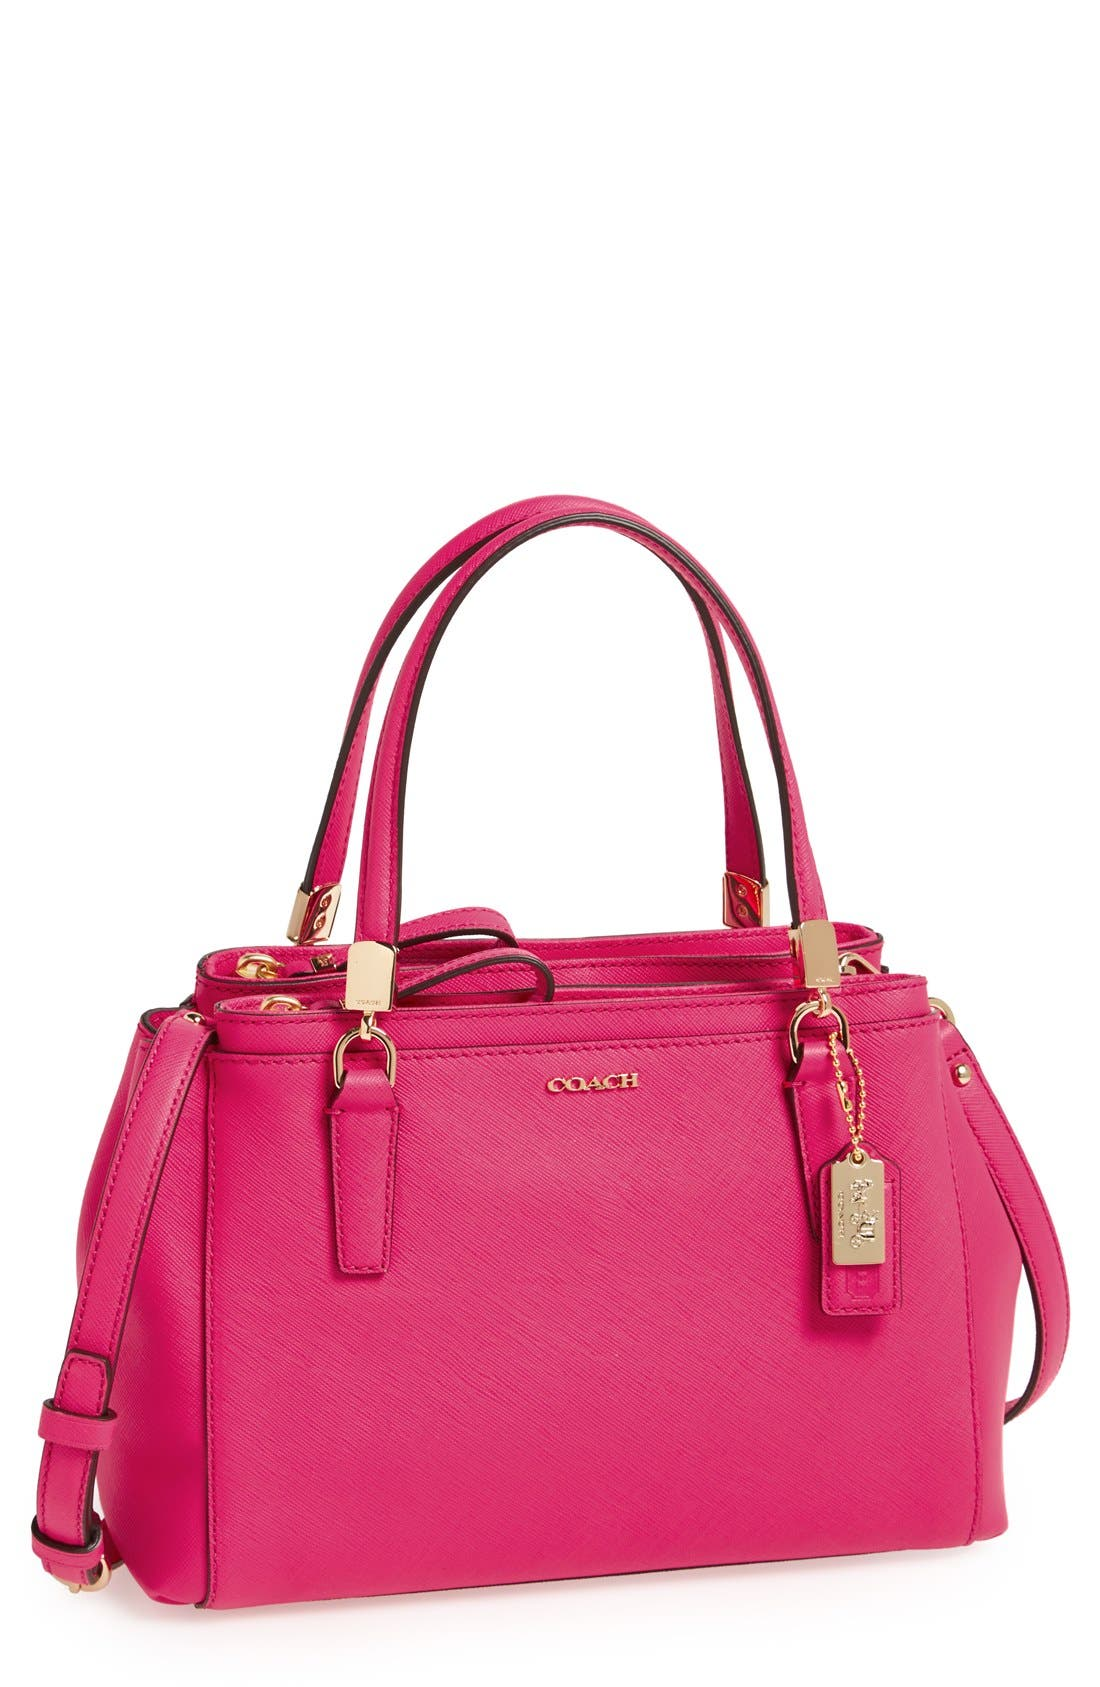 Main Image - COACH 'Madison - Mini Christie' Saffiano Leather Satchel